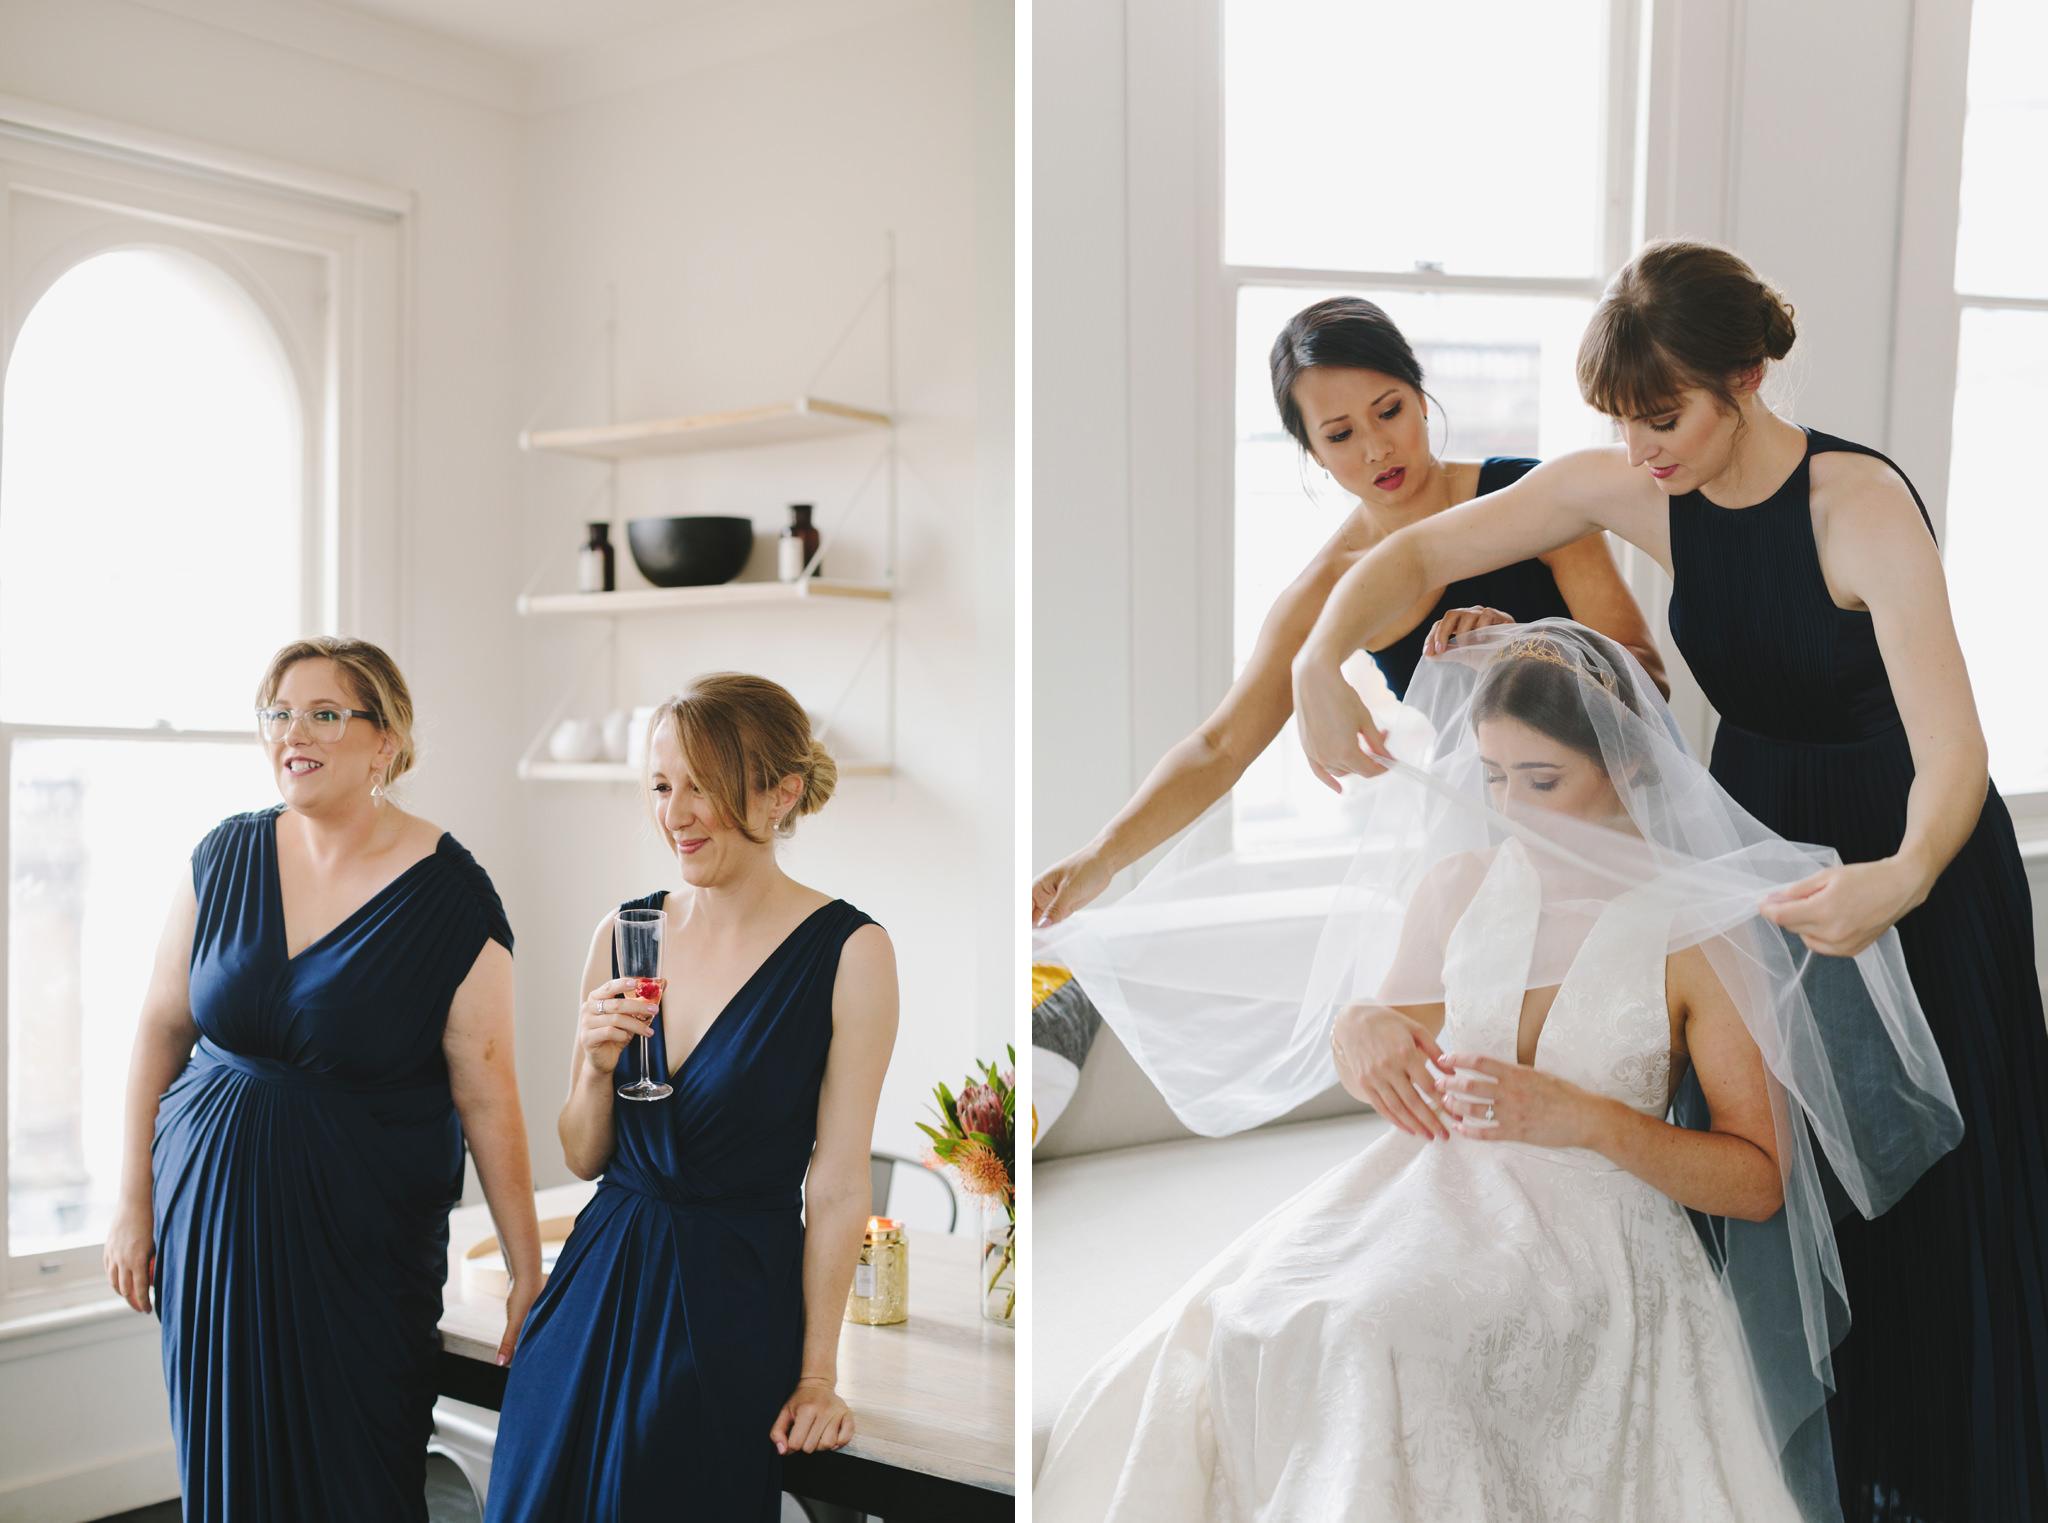 Abbotsford_Convent_Wedding_Peter_Anna033.JPG